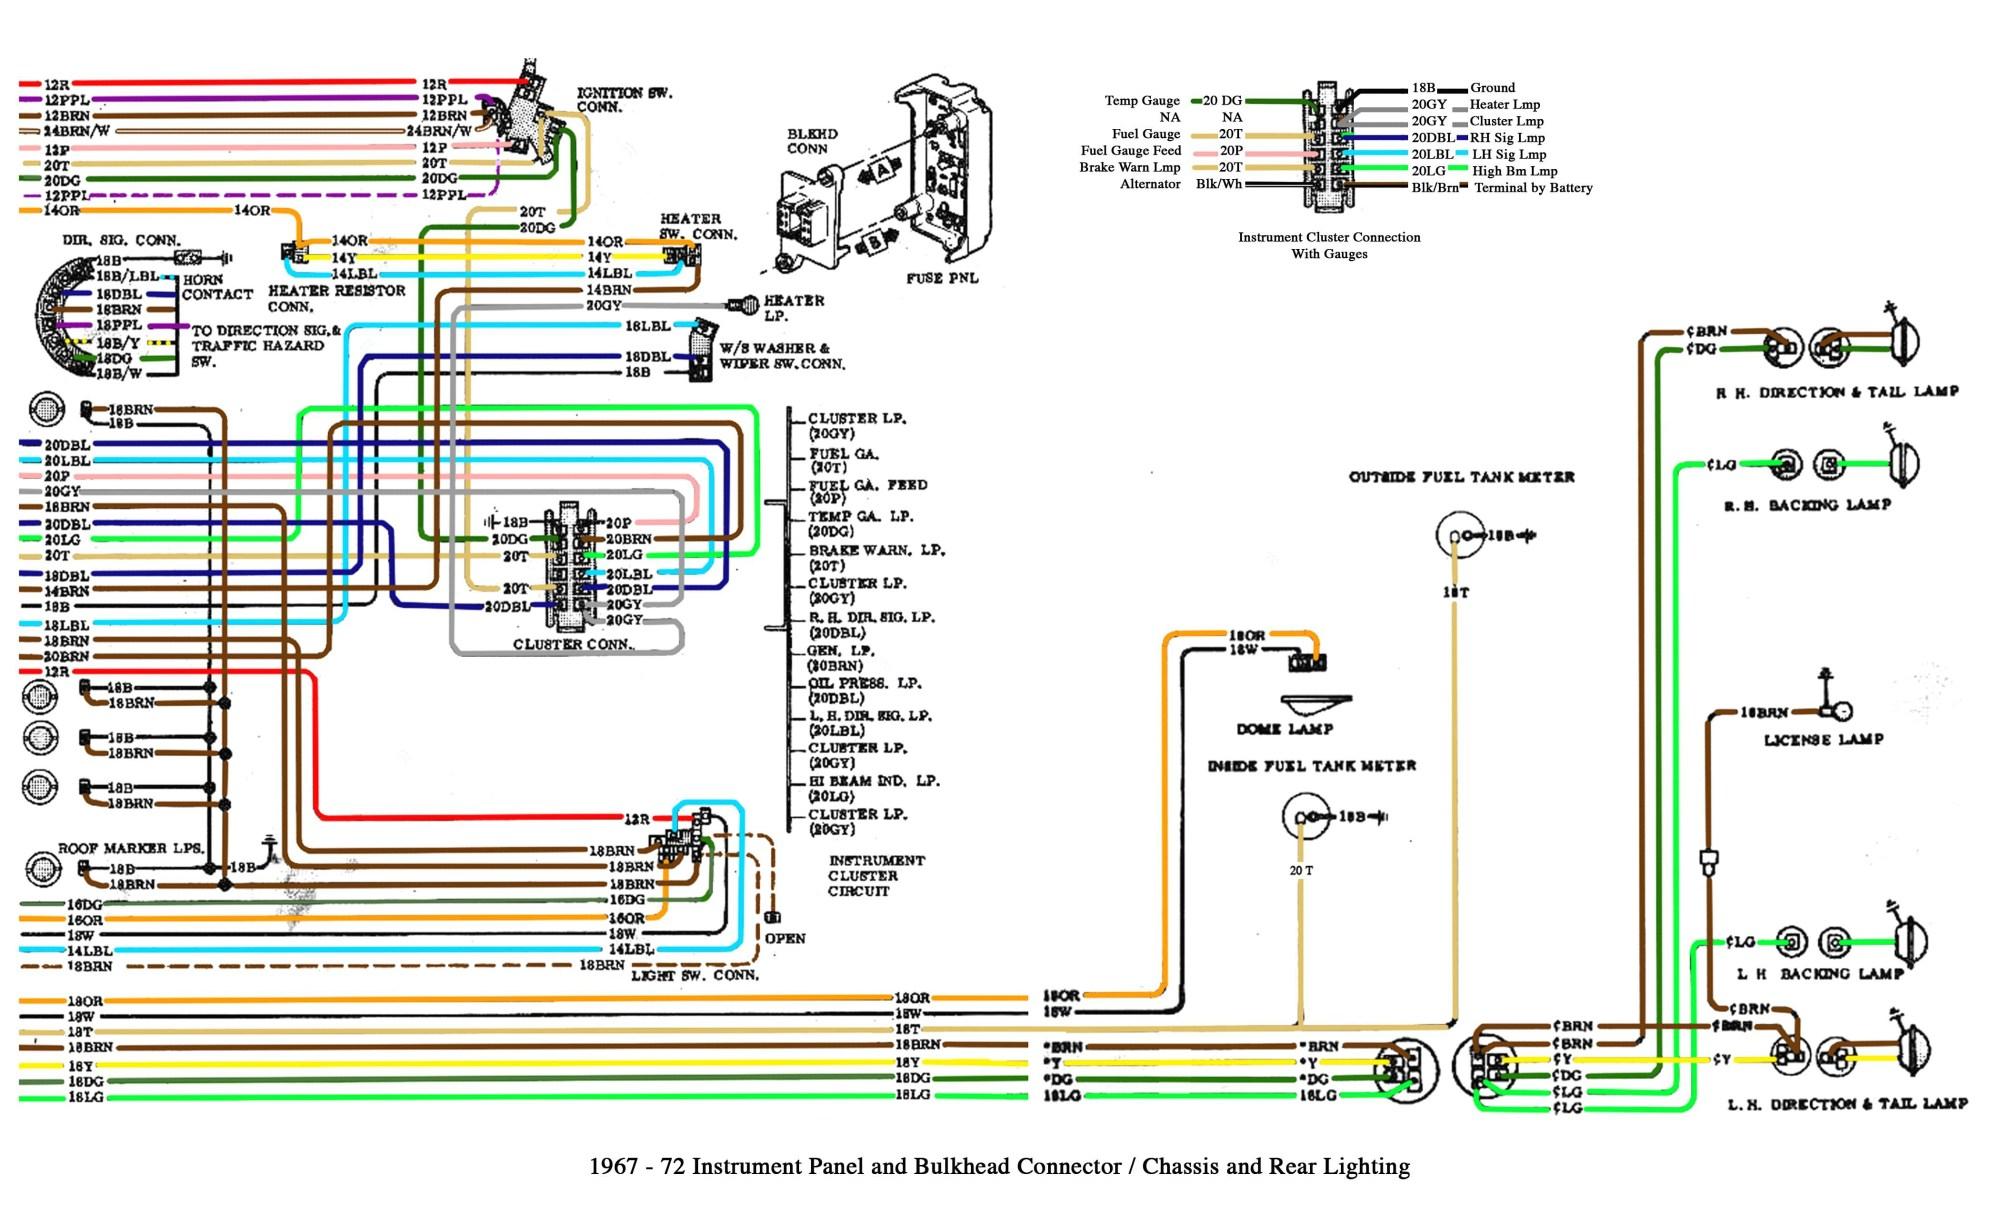 hight resolution of 1990 chevy silverado radio wiring diagram download 2003 chevy silverado radio wiring diagram best 9